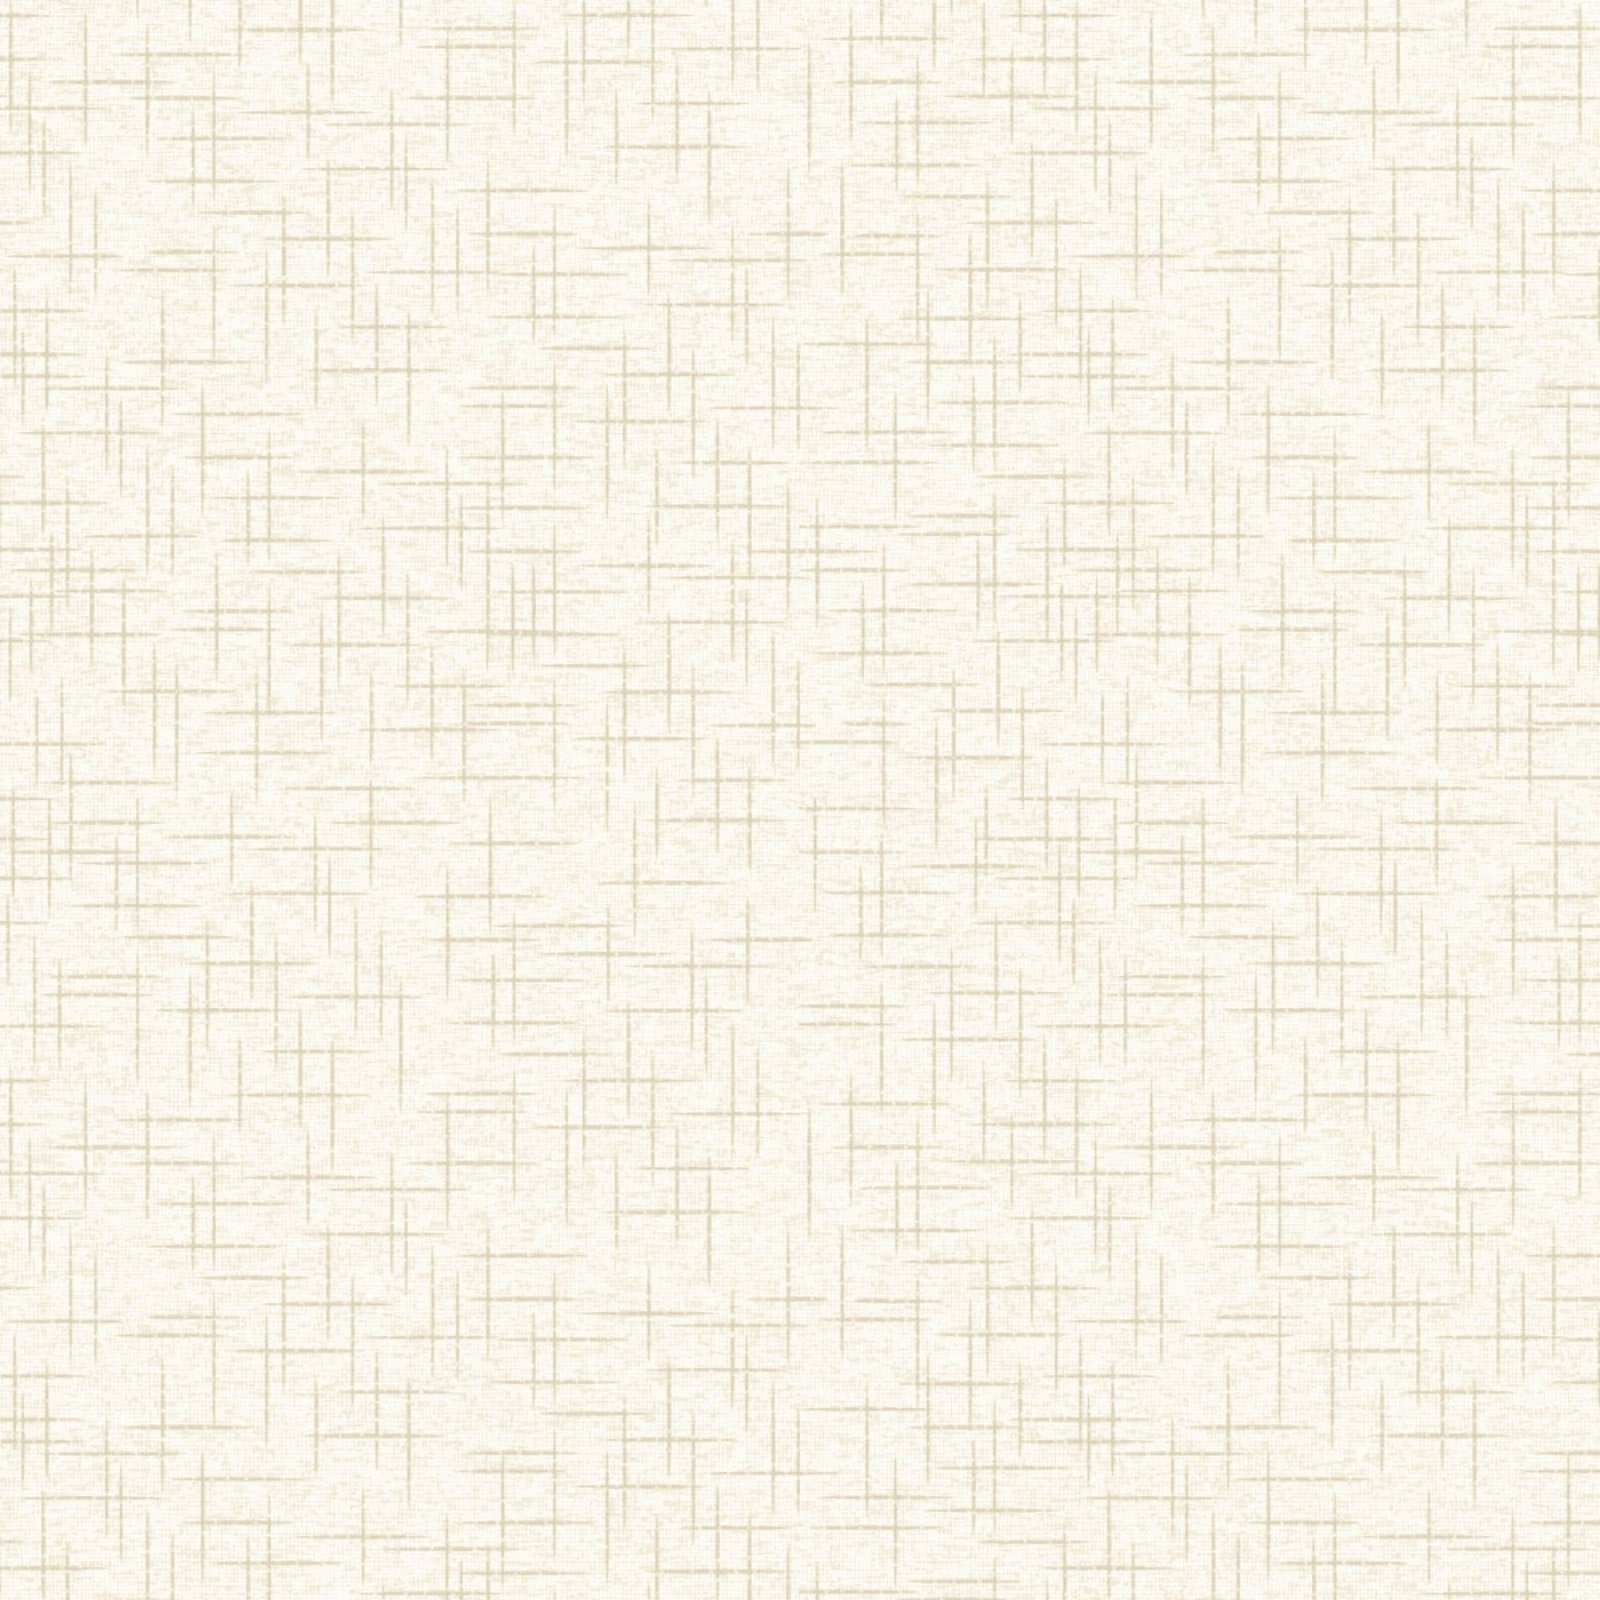 Kimberbell Basics Linen Texture Cream MAS9399-E